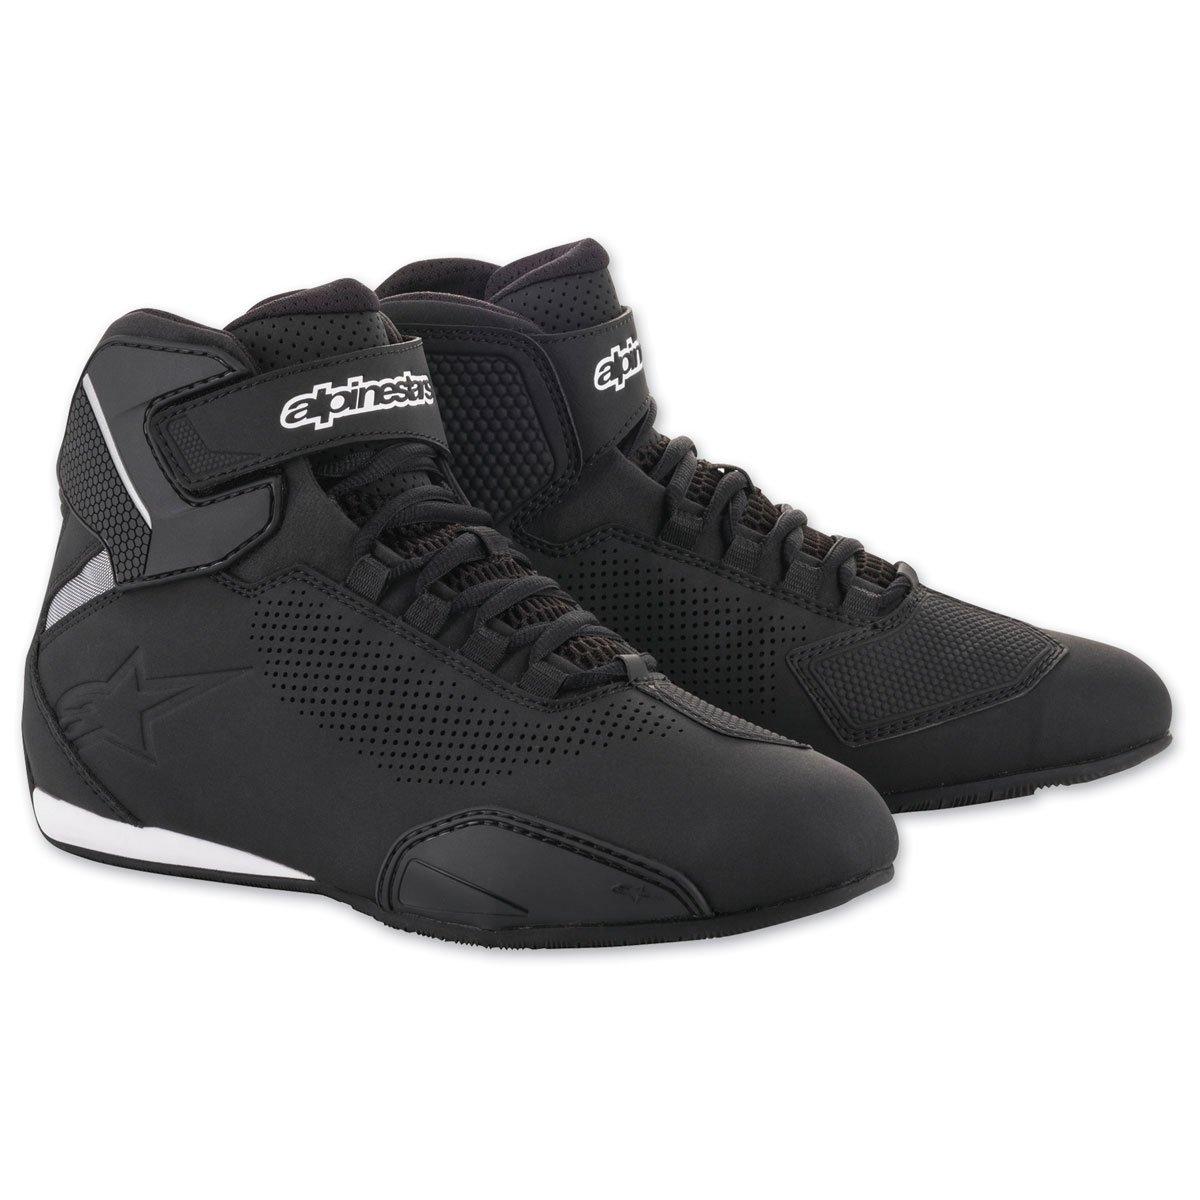 Alpinestars Mens 251561813195 Shoe Black//Grey//Red Size 9.5